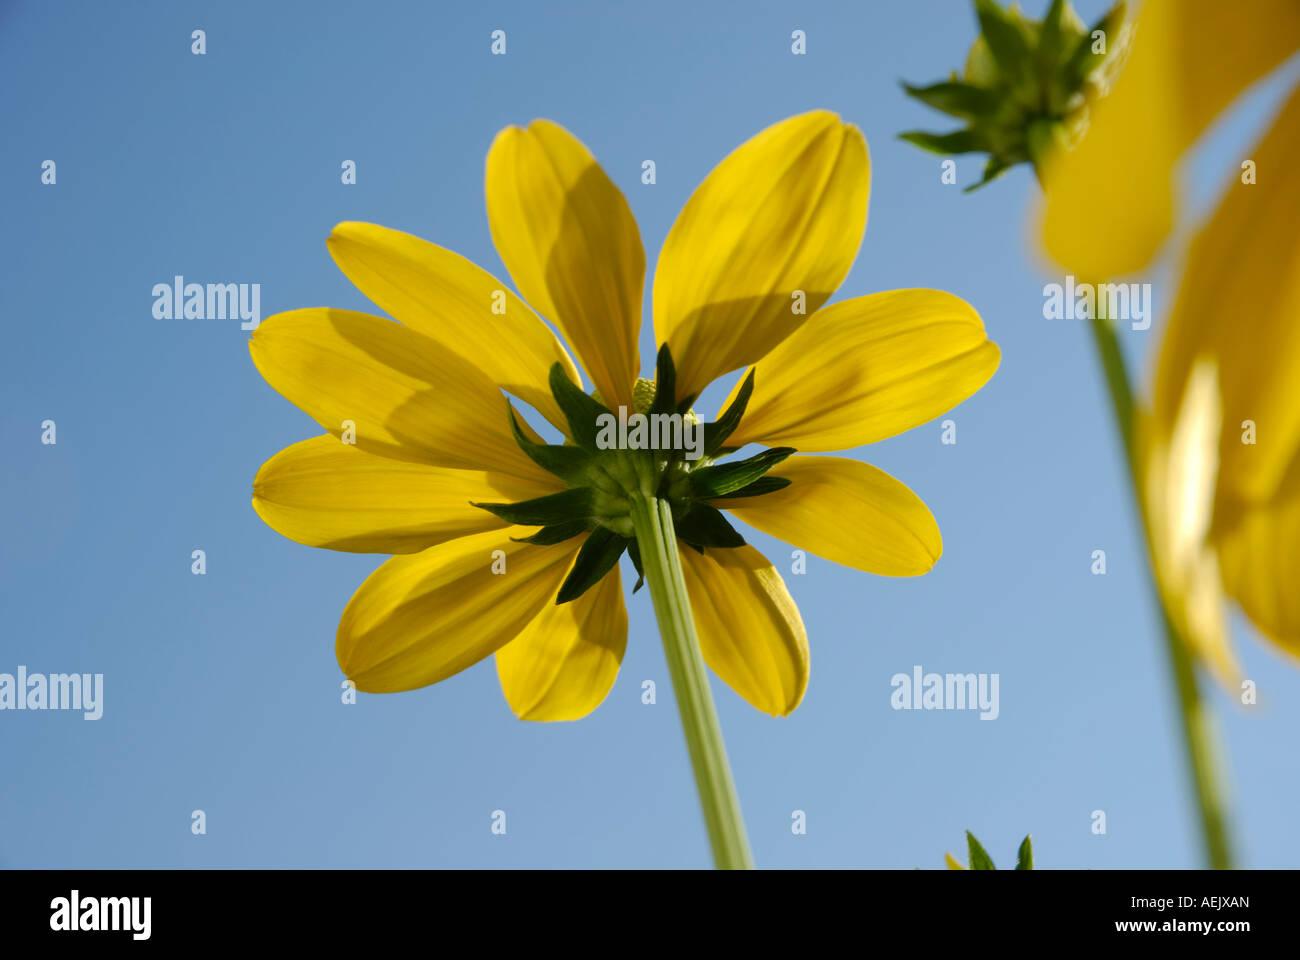 Yellow flowers of rudbeckia nitida, Asteraceae Stock Photo